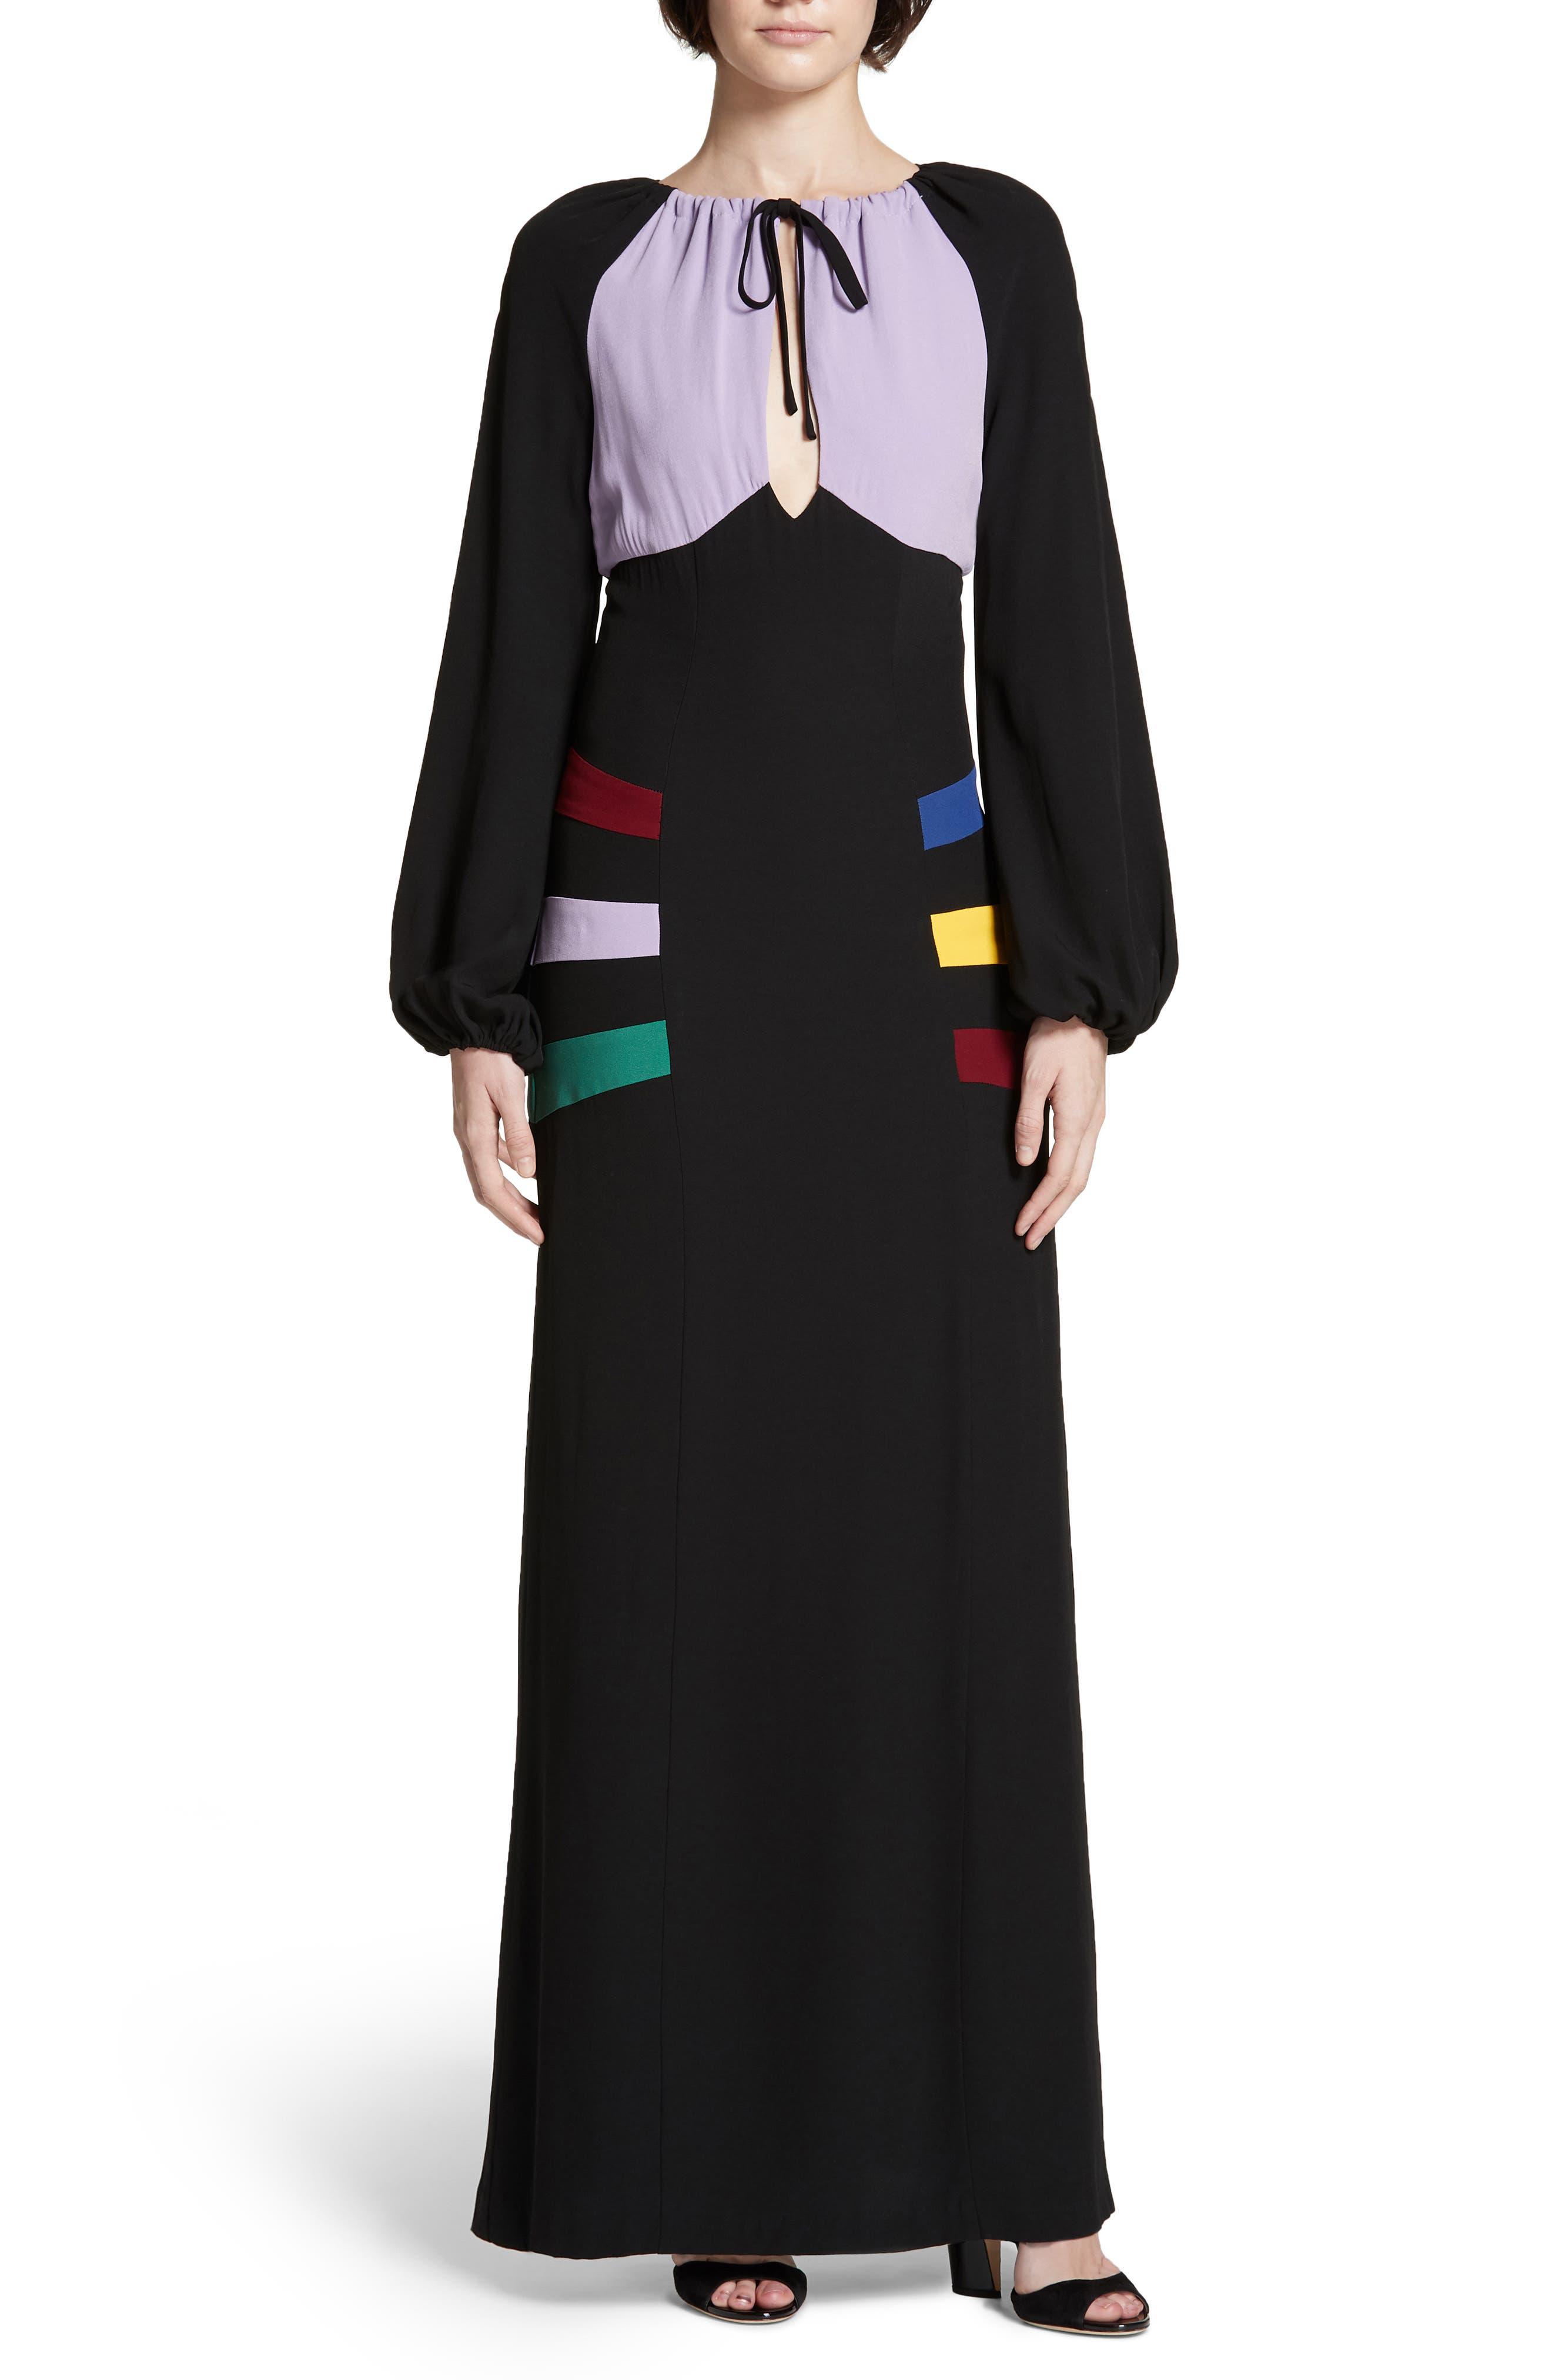 70s Prom, Formal, Evening, Party Dresses Womens Staud Pacha Maxi Dress Size 6 - Black $137.98 AT vintagedancer.com